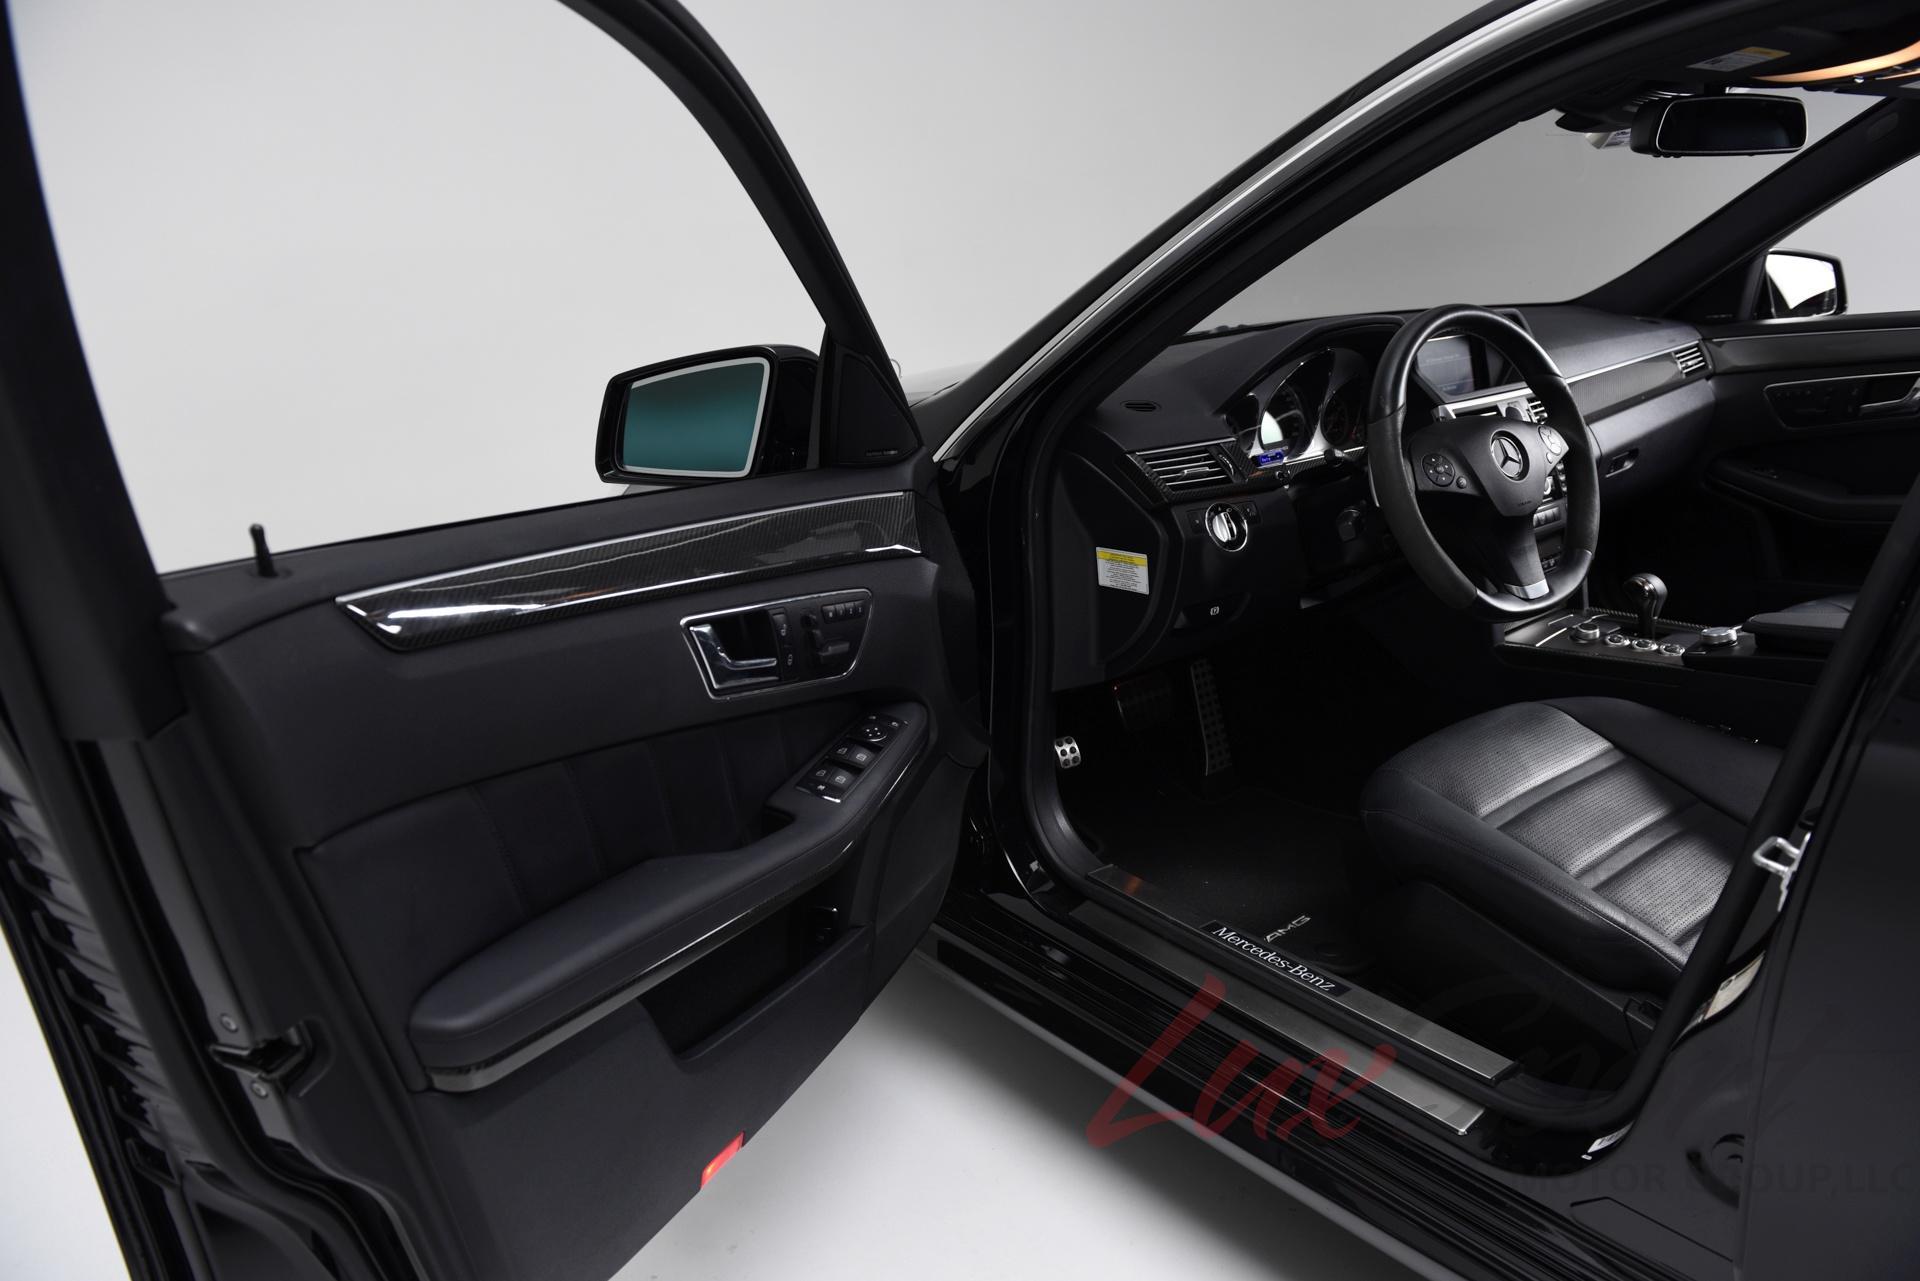 2010 mercedes benz e63 amg e63 amg stock 2010101a for. Black Bedroom Furniture Sets. Home Design Ideas